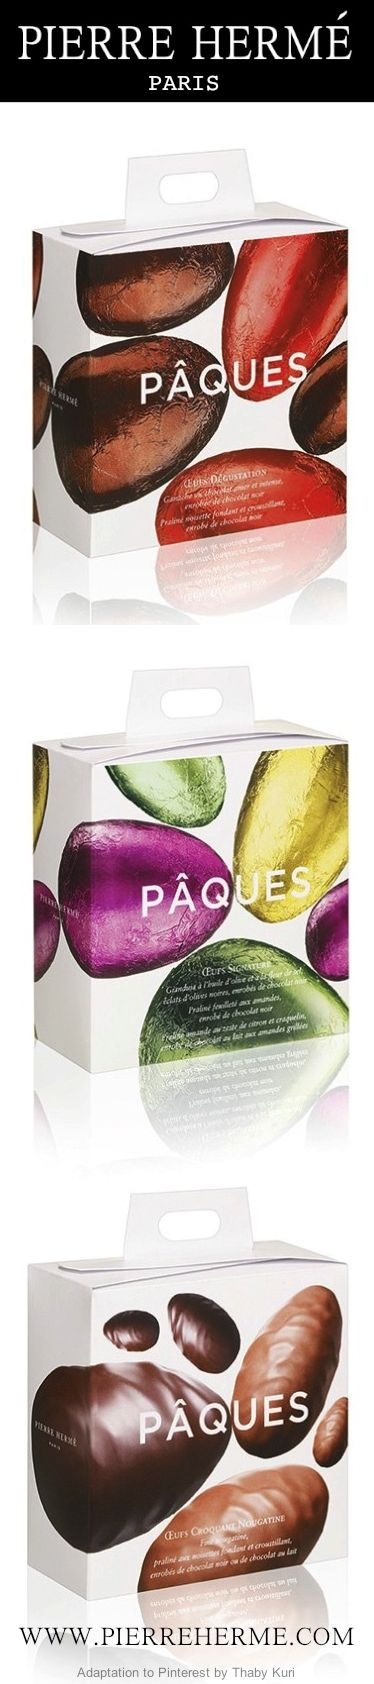 PIERRE HERME Pâques Chocolate Pralines #chocolate #packaging #gourmandises